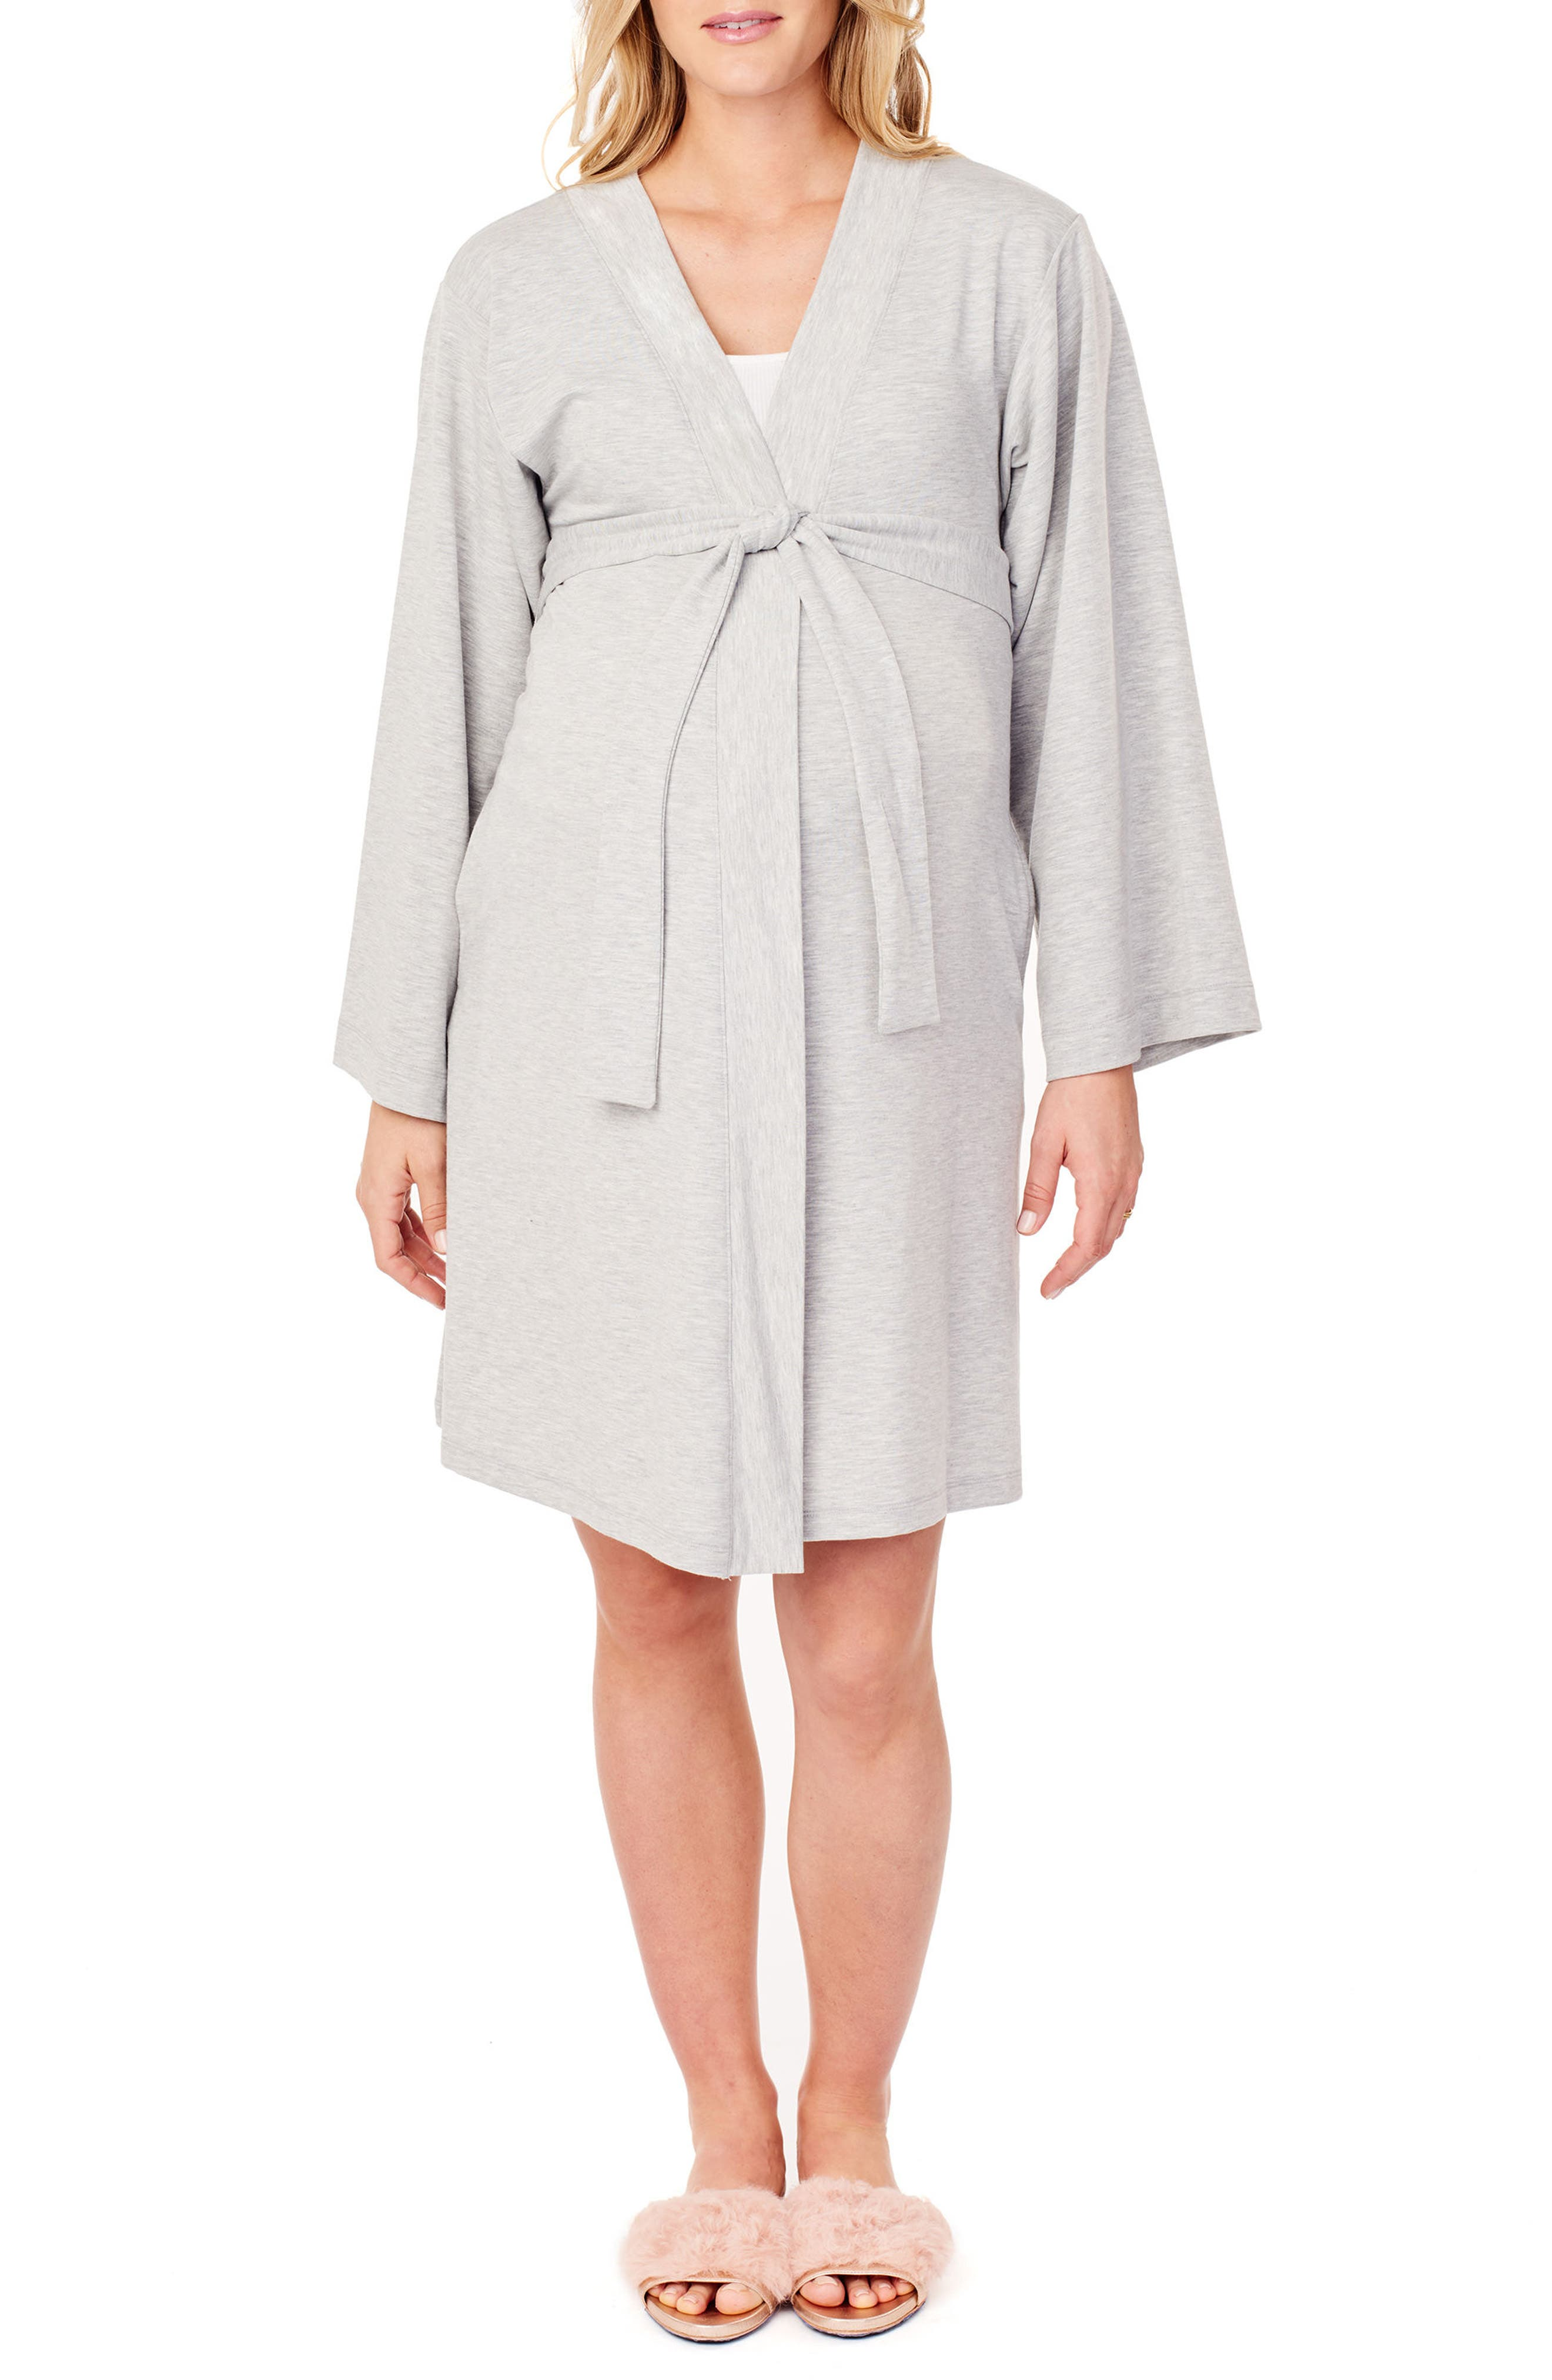 INGRID & ISABEL<SUP>®</SUP>, Kimono Lounge Maternity Robe, Main thumbnail 1, color, LIGHT HEATHER GREY